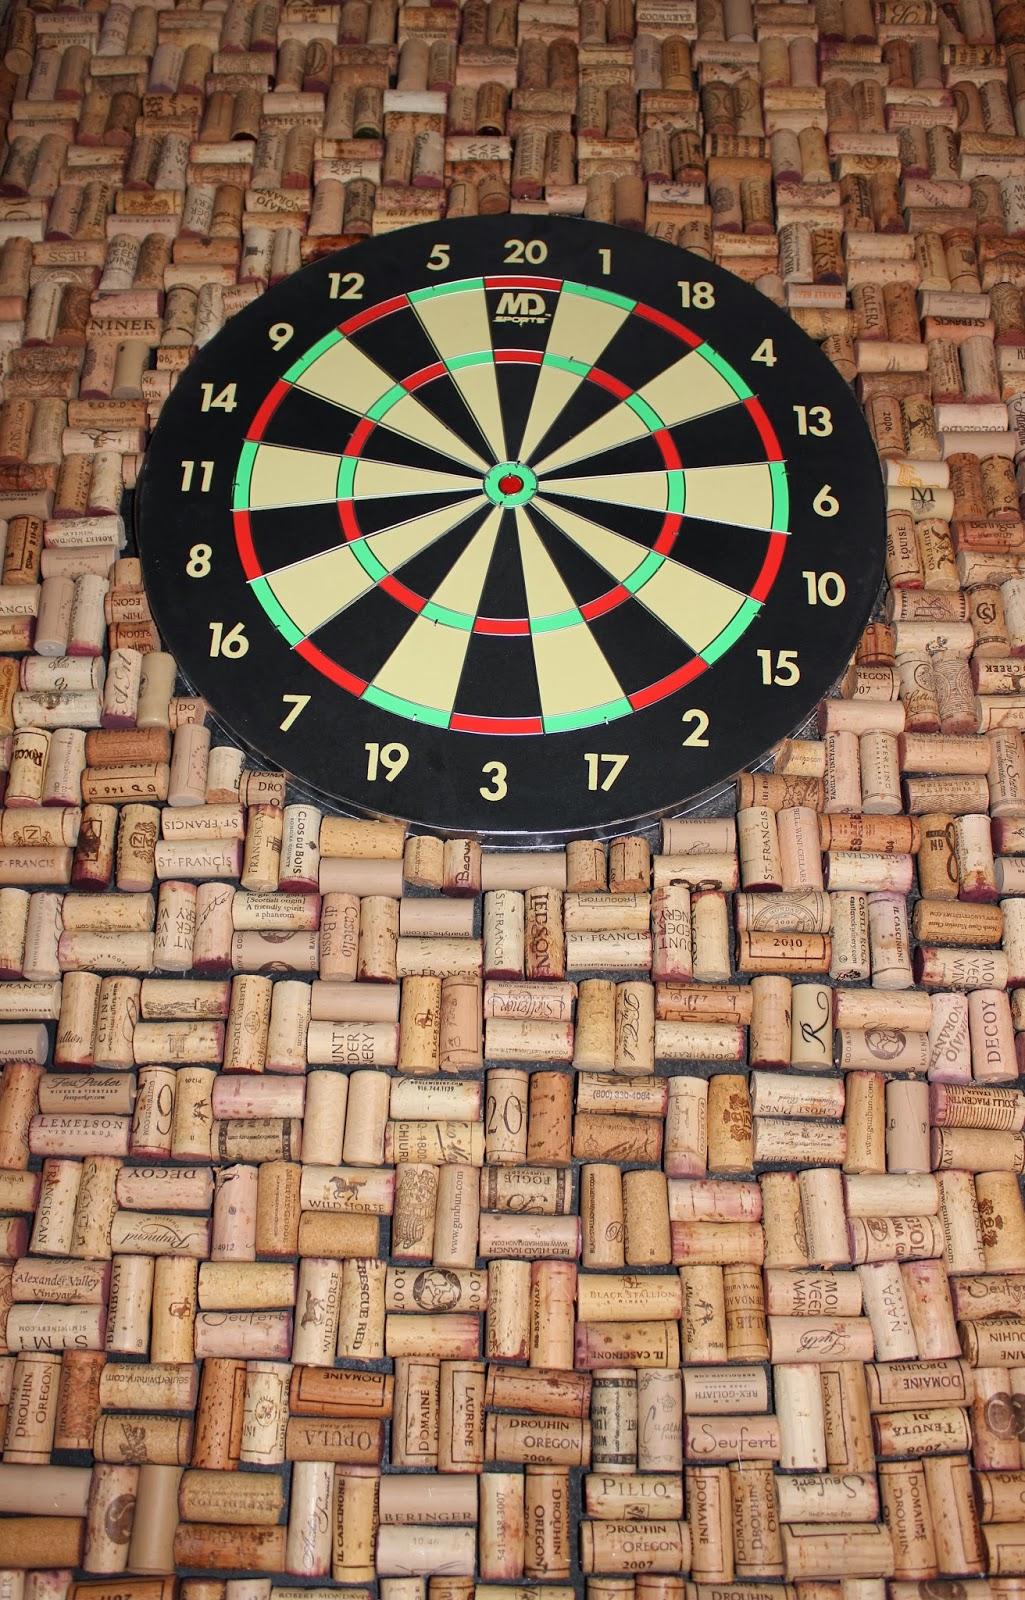 Tice's Tidbits: DIY...Wine Cork Dart Board